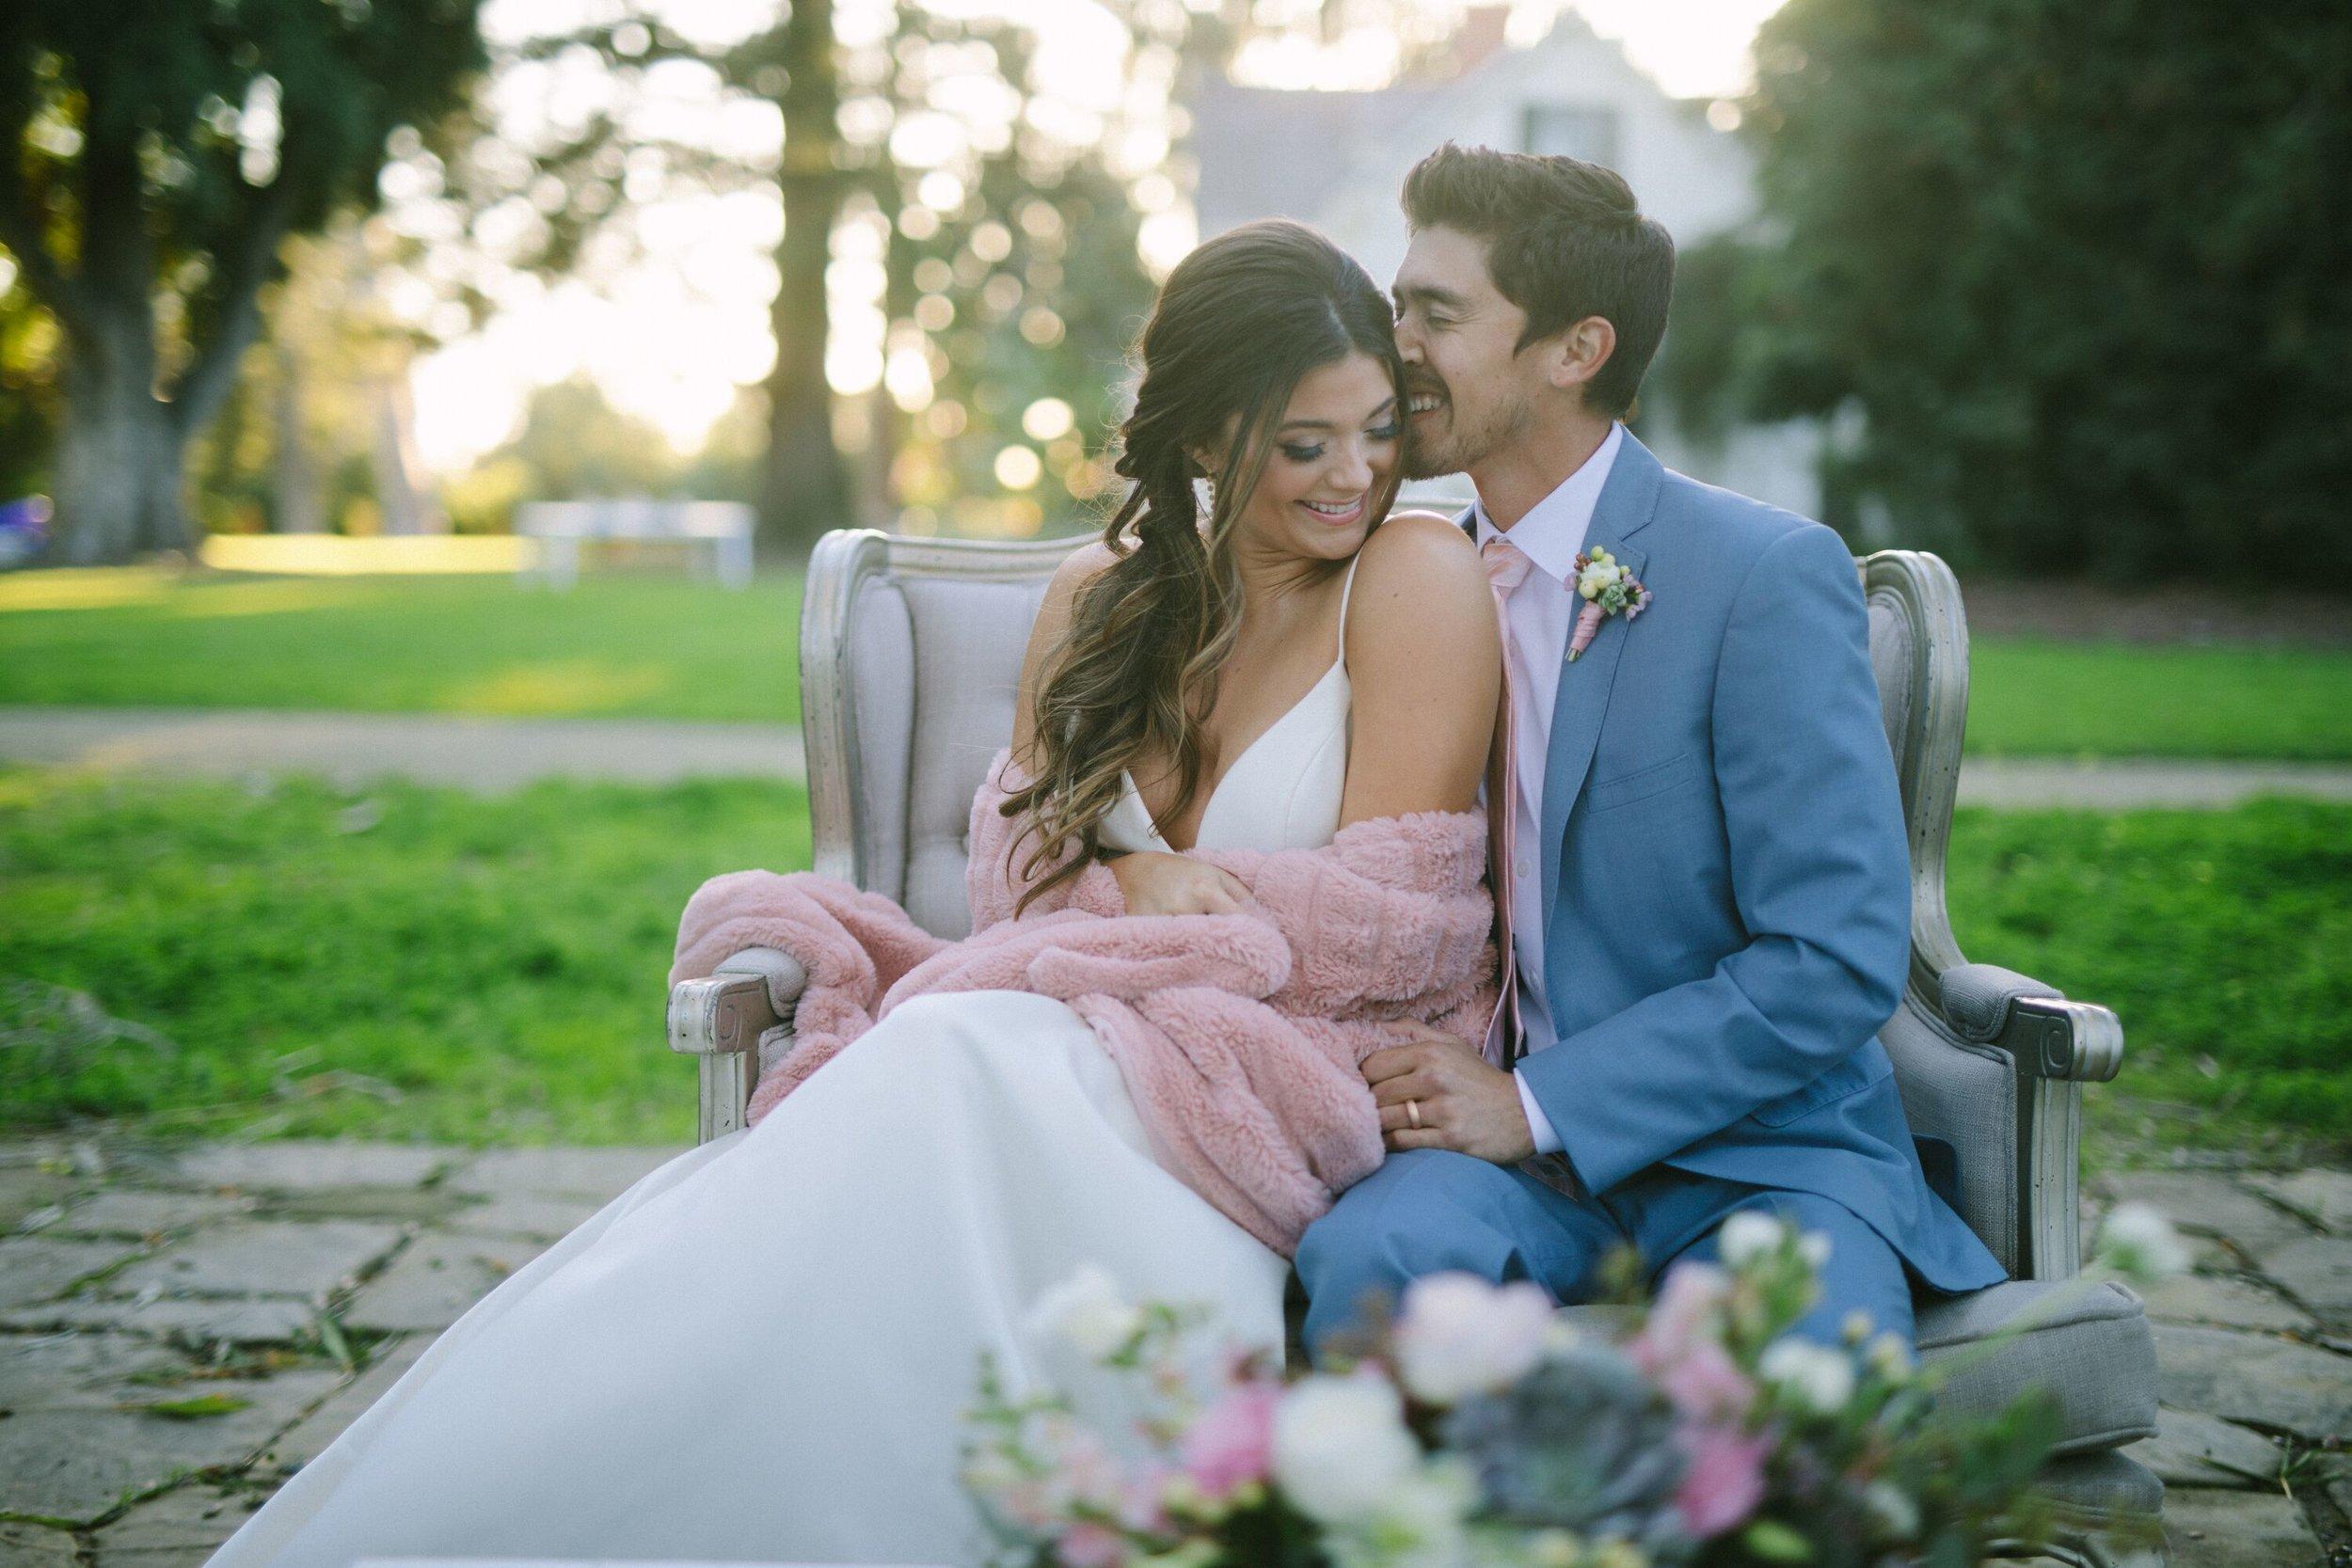 www.santabarbarawedding.com | Photographer: Patrick Ang | Venue: Rancho La Patera & Stow House | Wedding Planner: Elyse Rowen of Elyse Events | Bride and Groom Cuddle